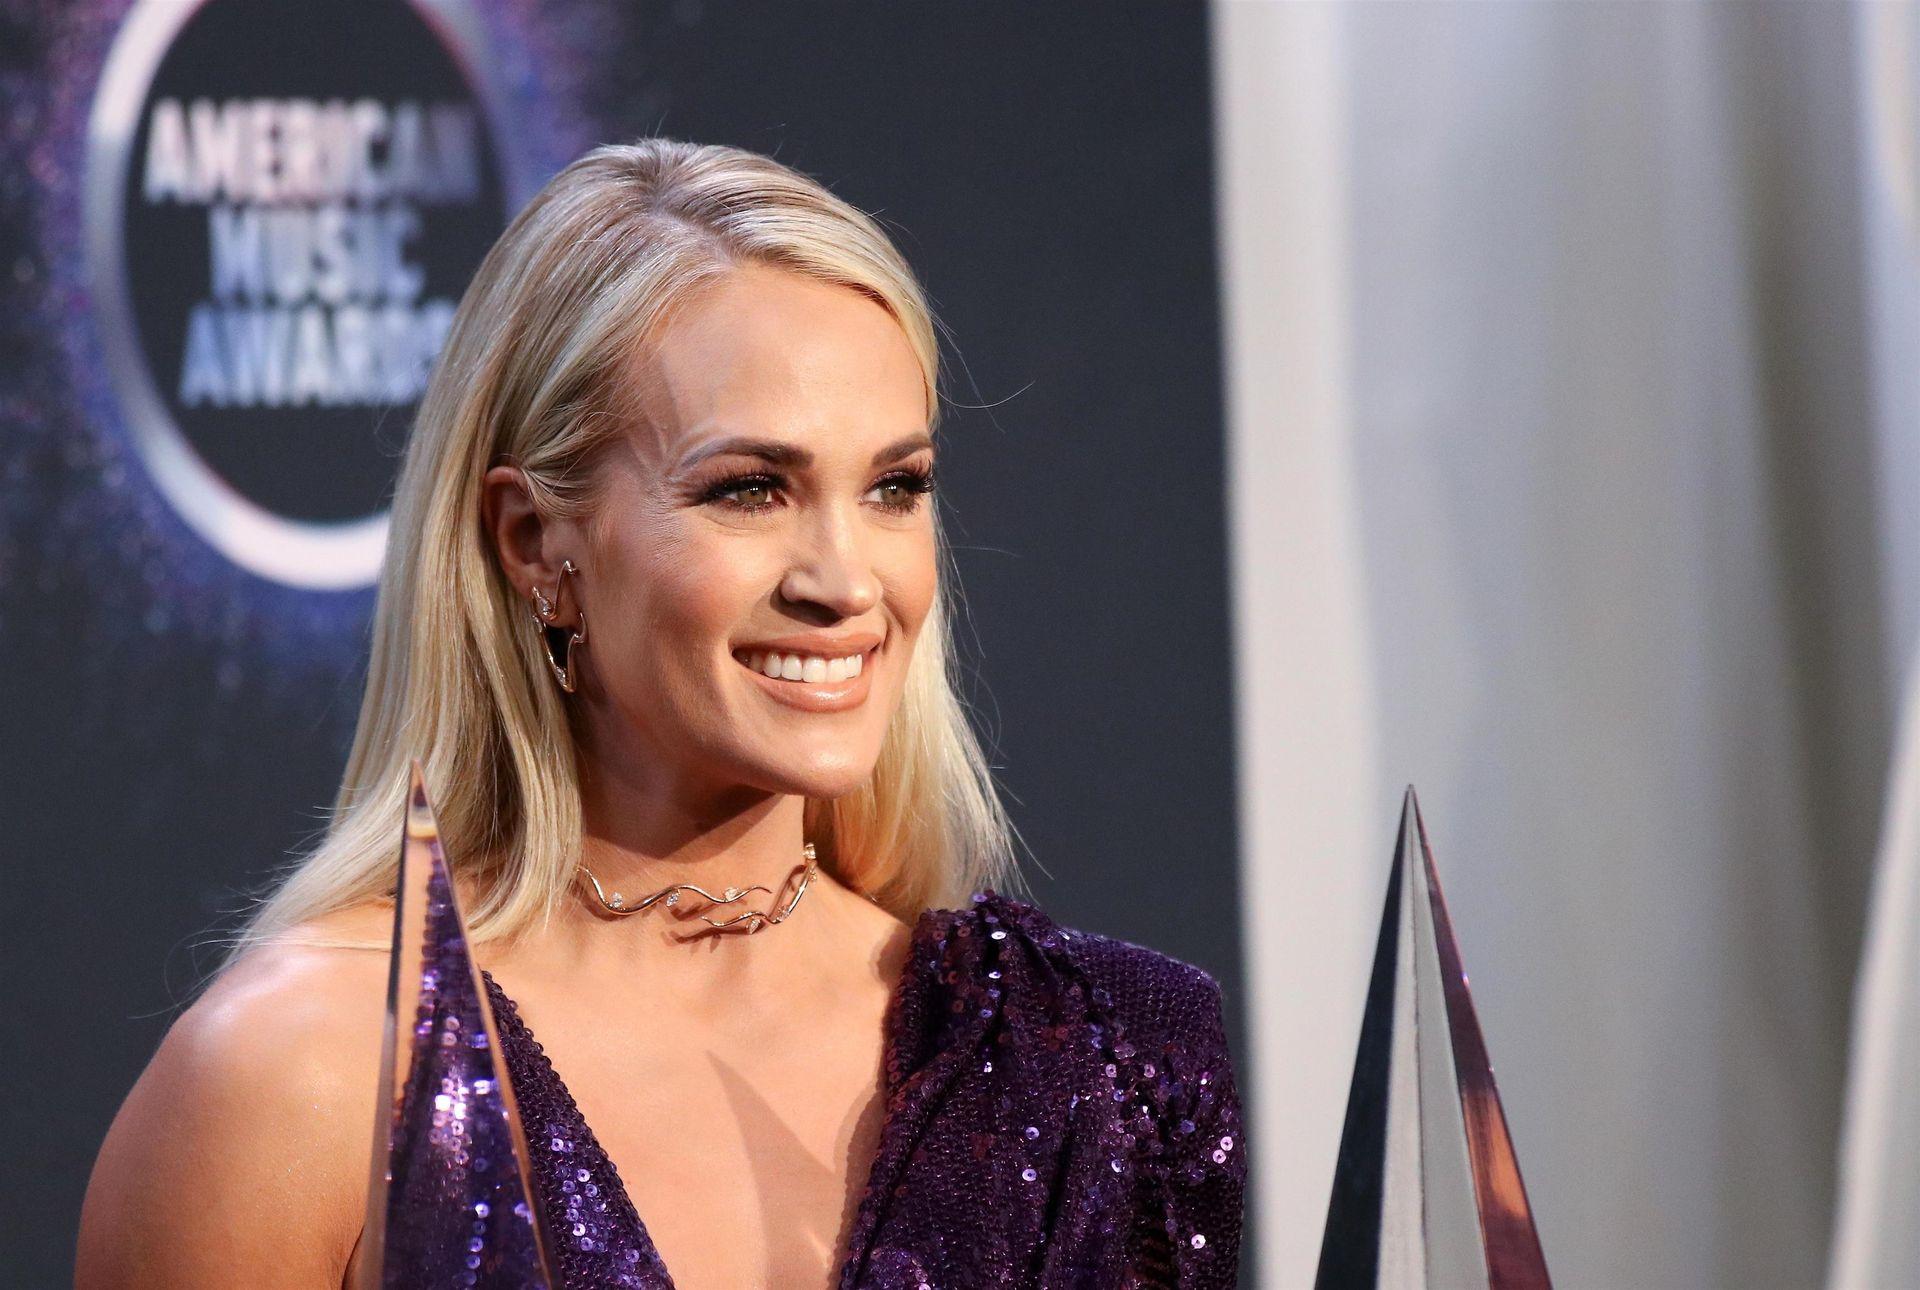 Carrie Underwood Sexy 0074